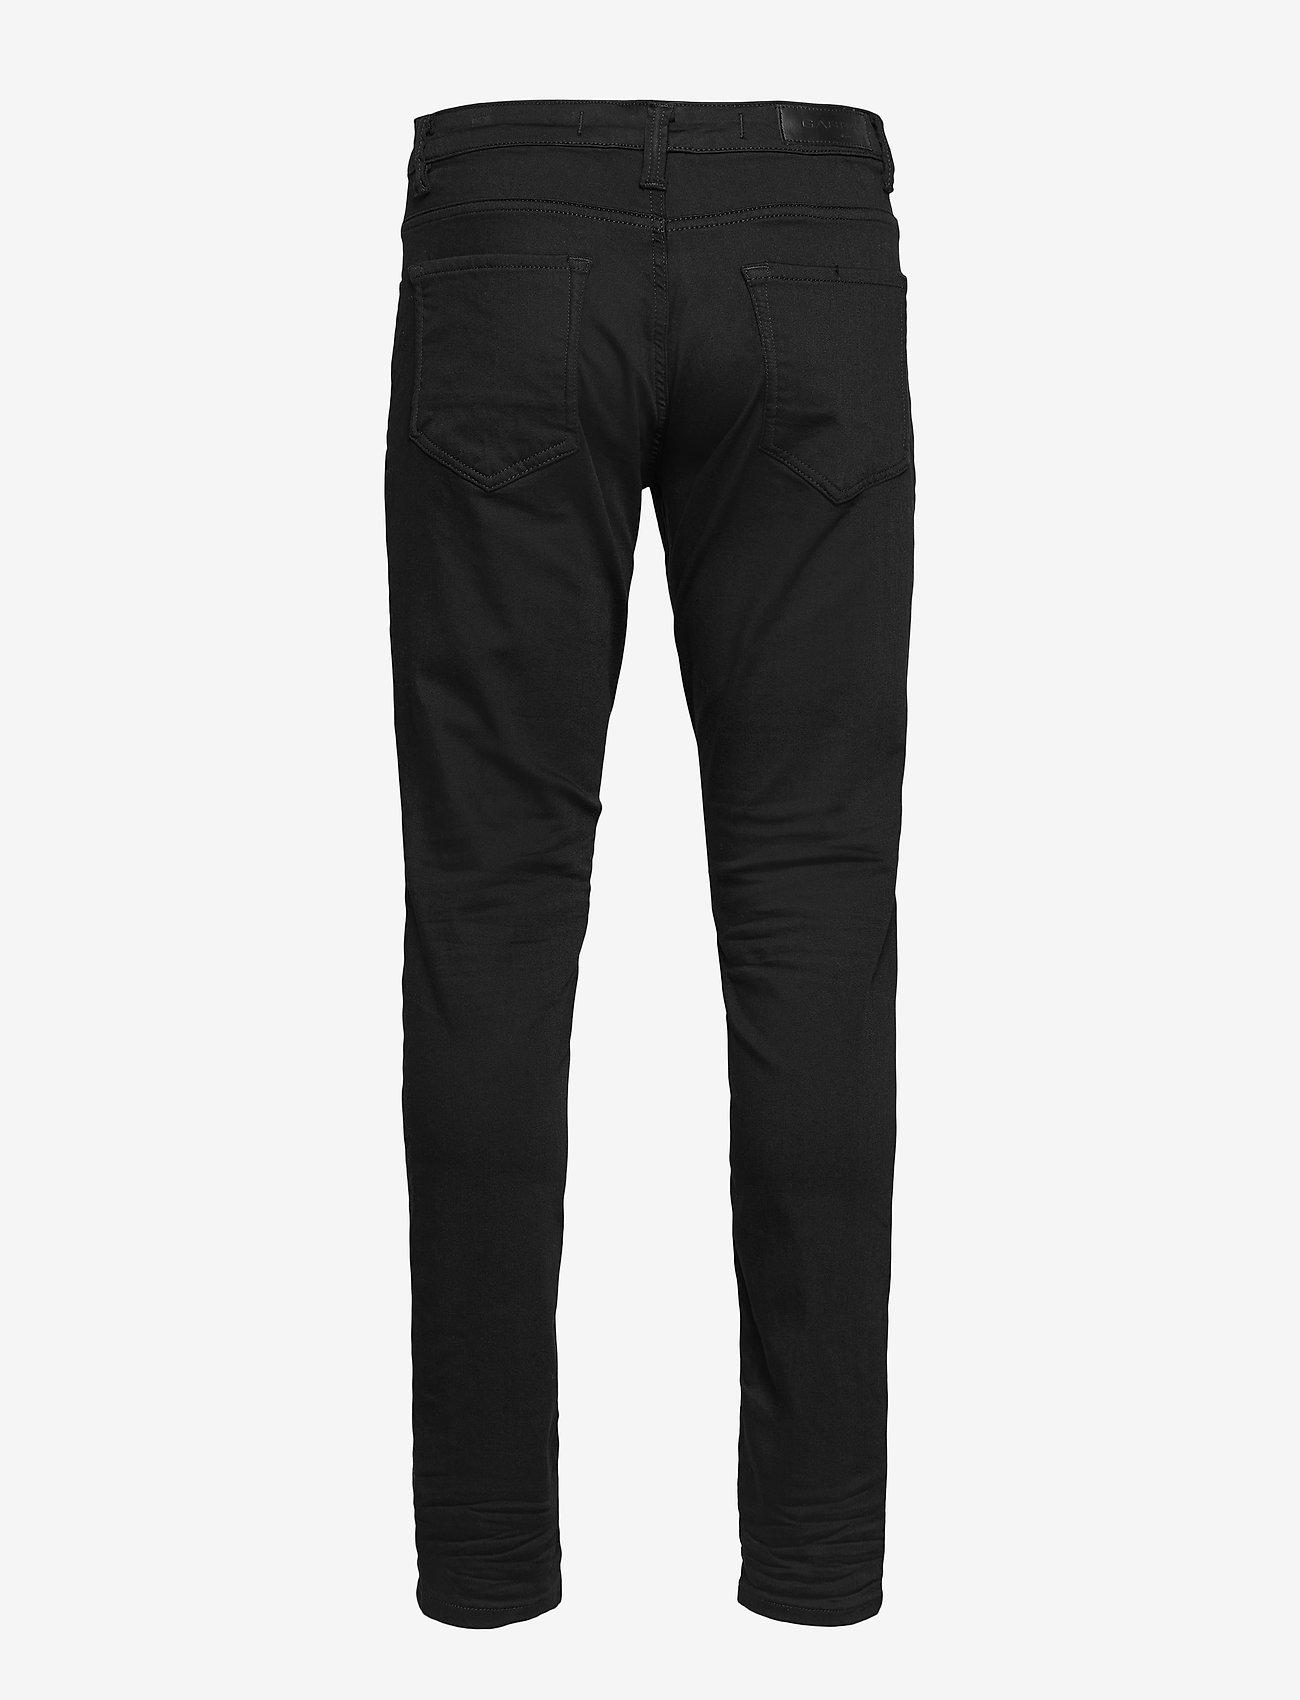 Gabba - Jones K1911 Black Jeans - slim jeans - rs0955 - 1